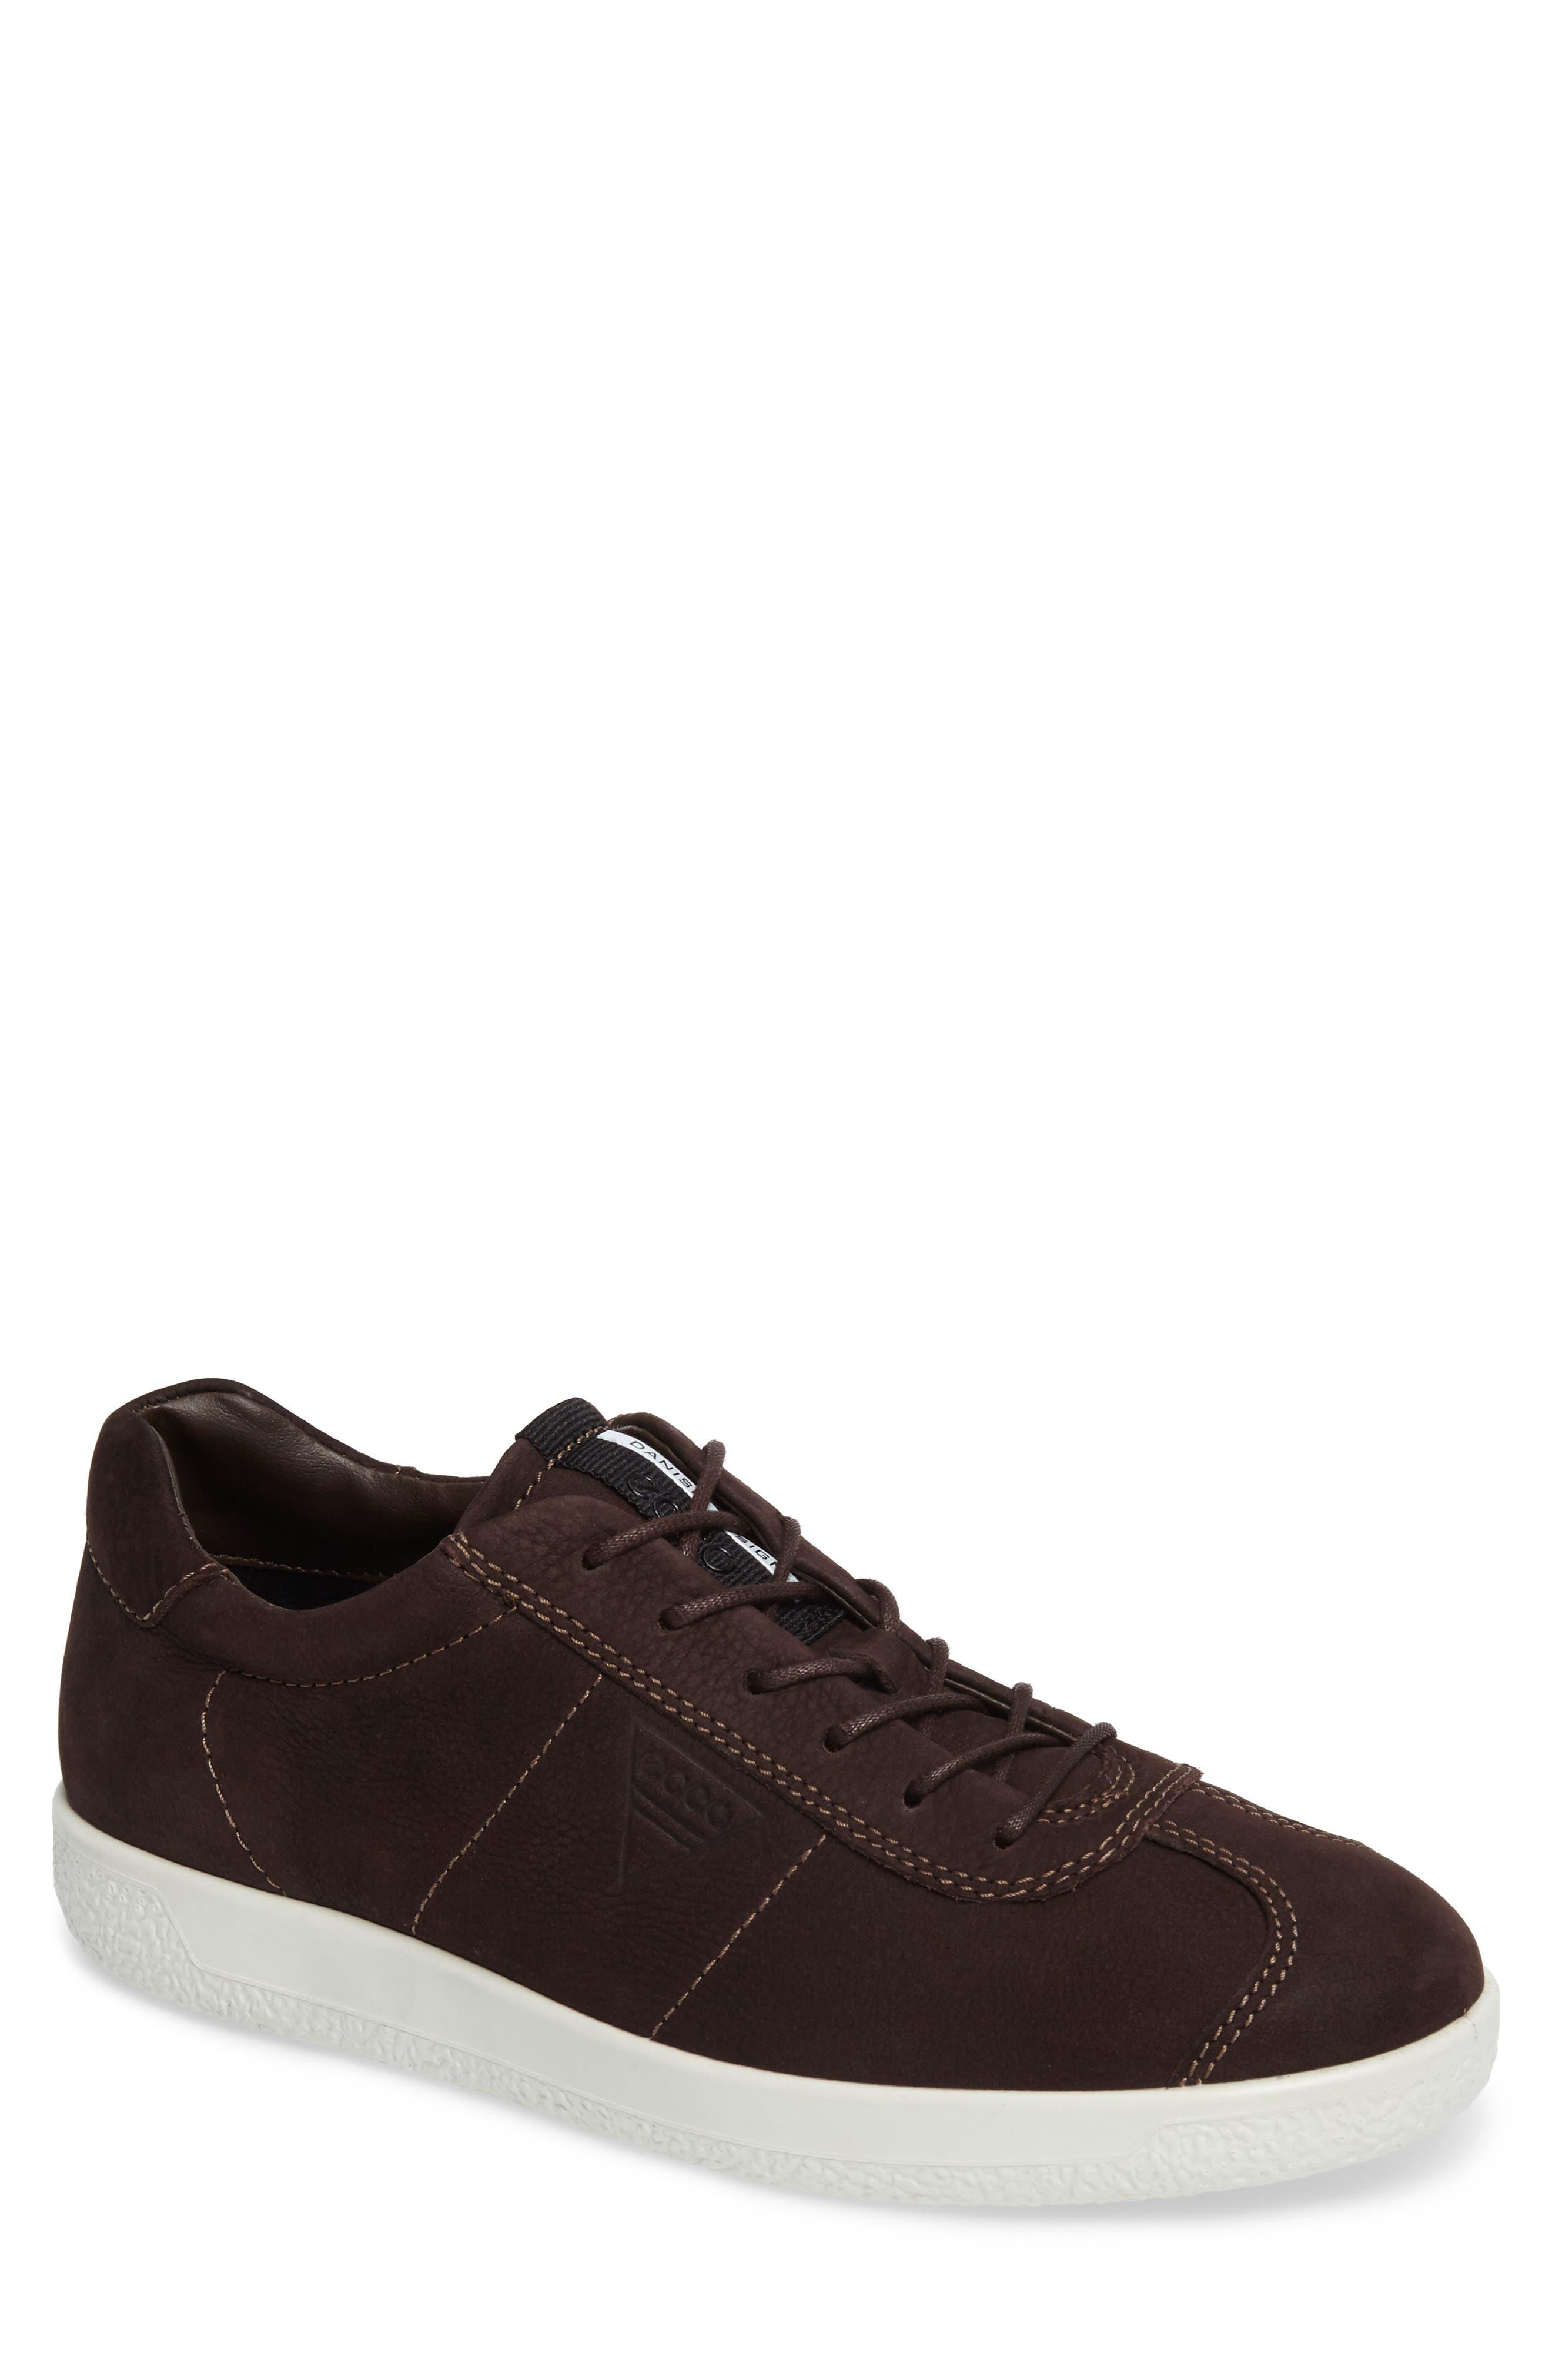 Soft 1 Sneaker,                             Main thumbnail 4, color,